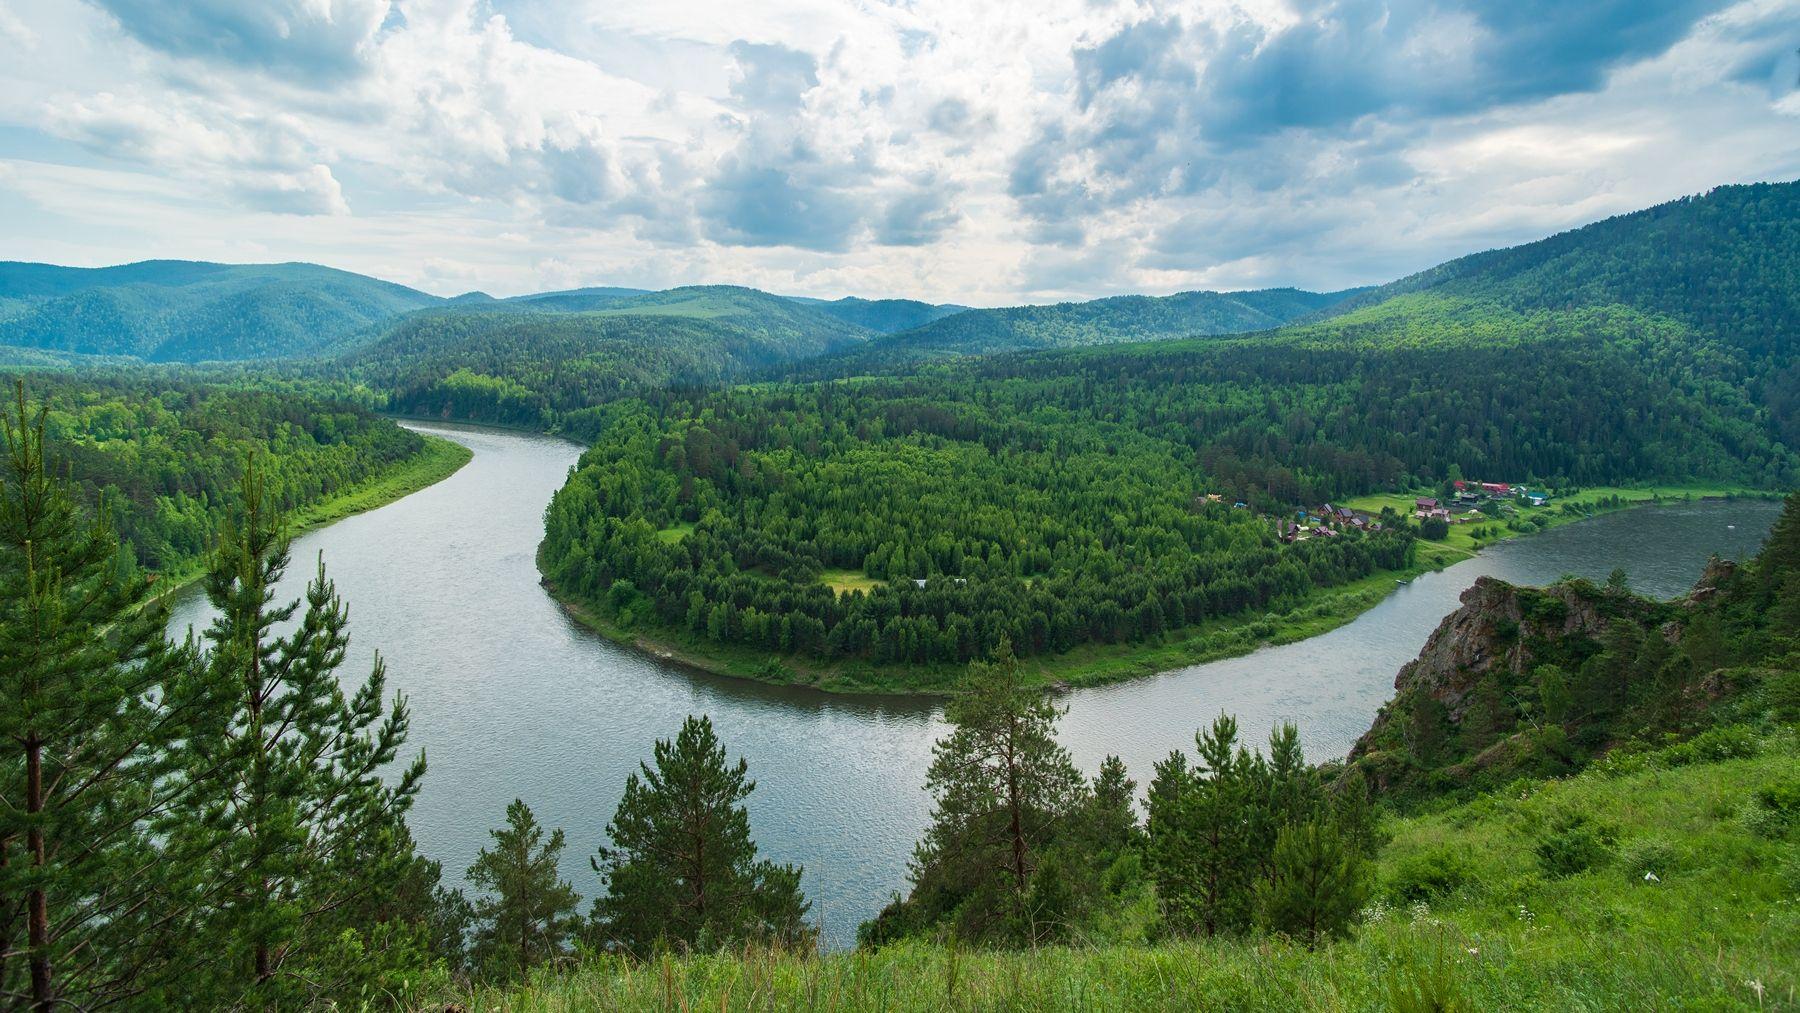 Перед грозой зелень лето лес тайга река Мана поворот излучина гроза облака панорамы горы